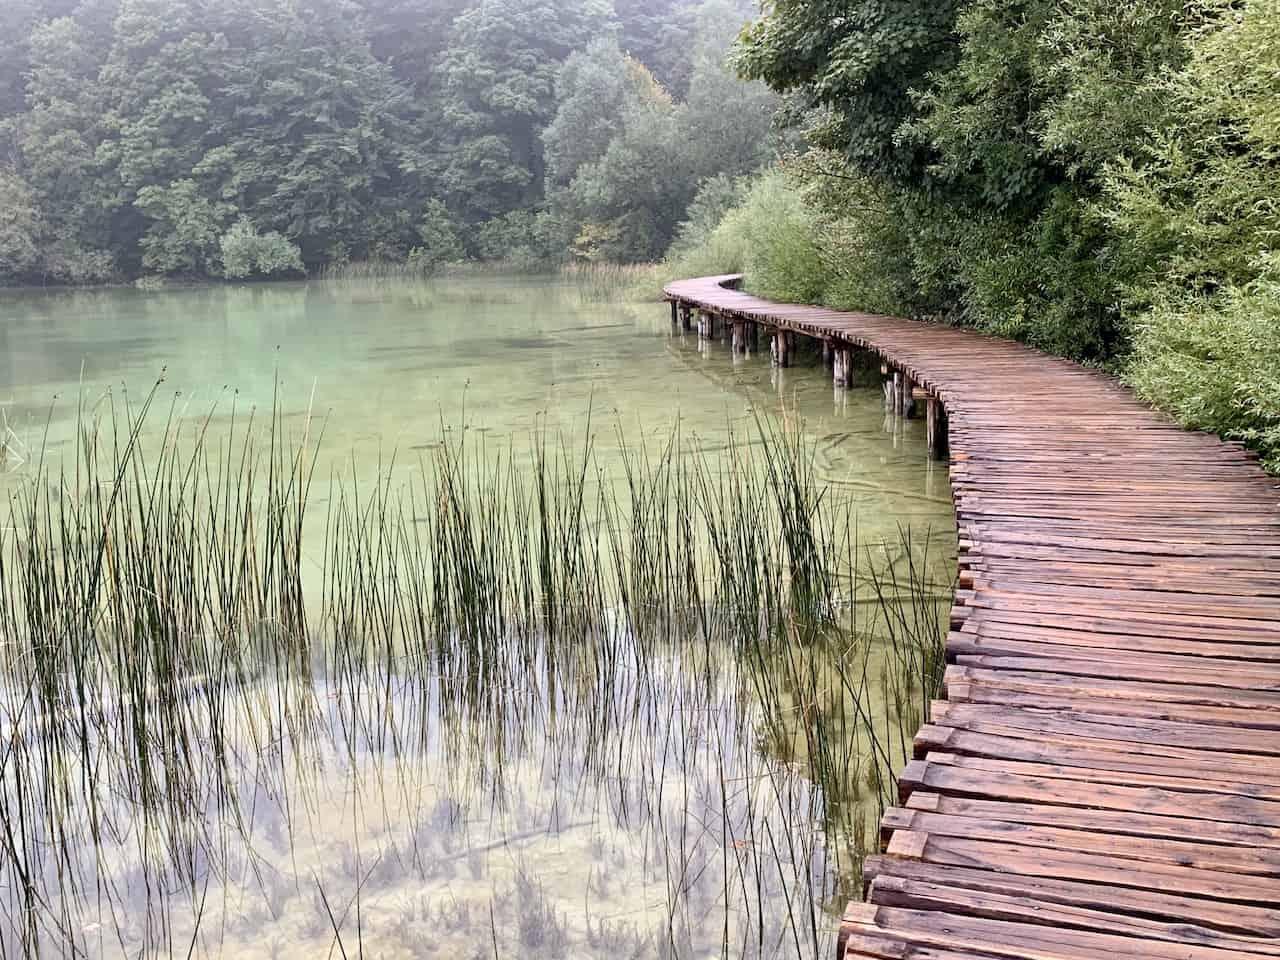 Upper Lakes Plitvice